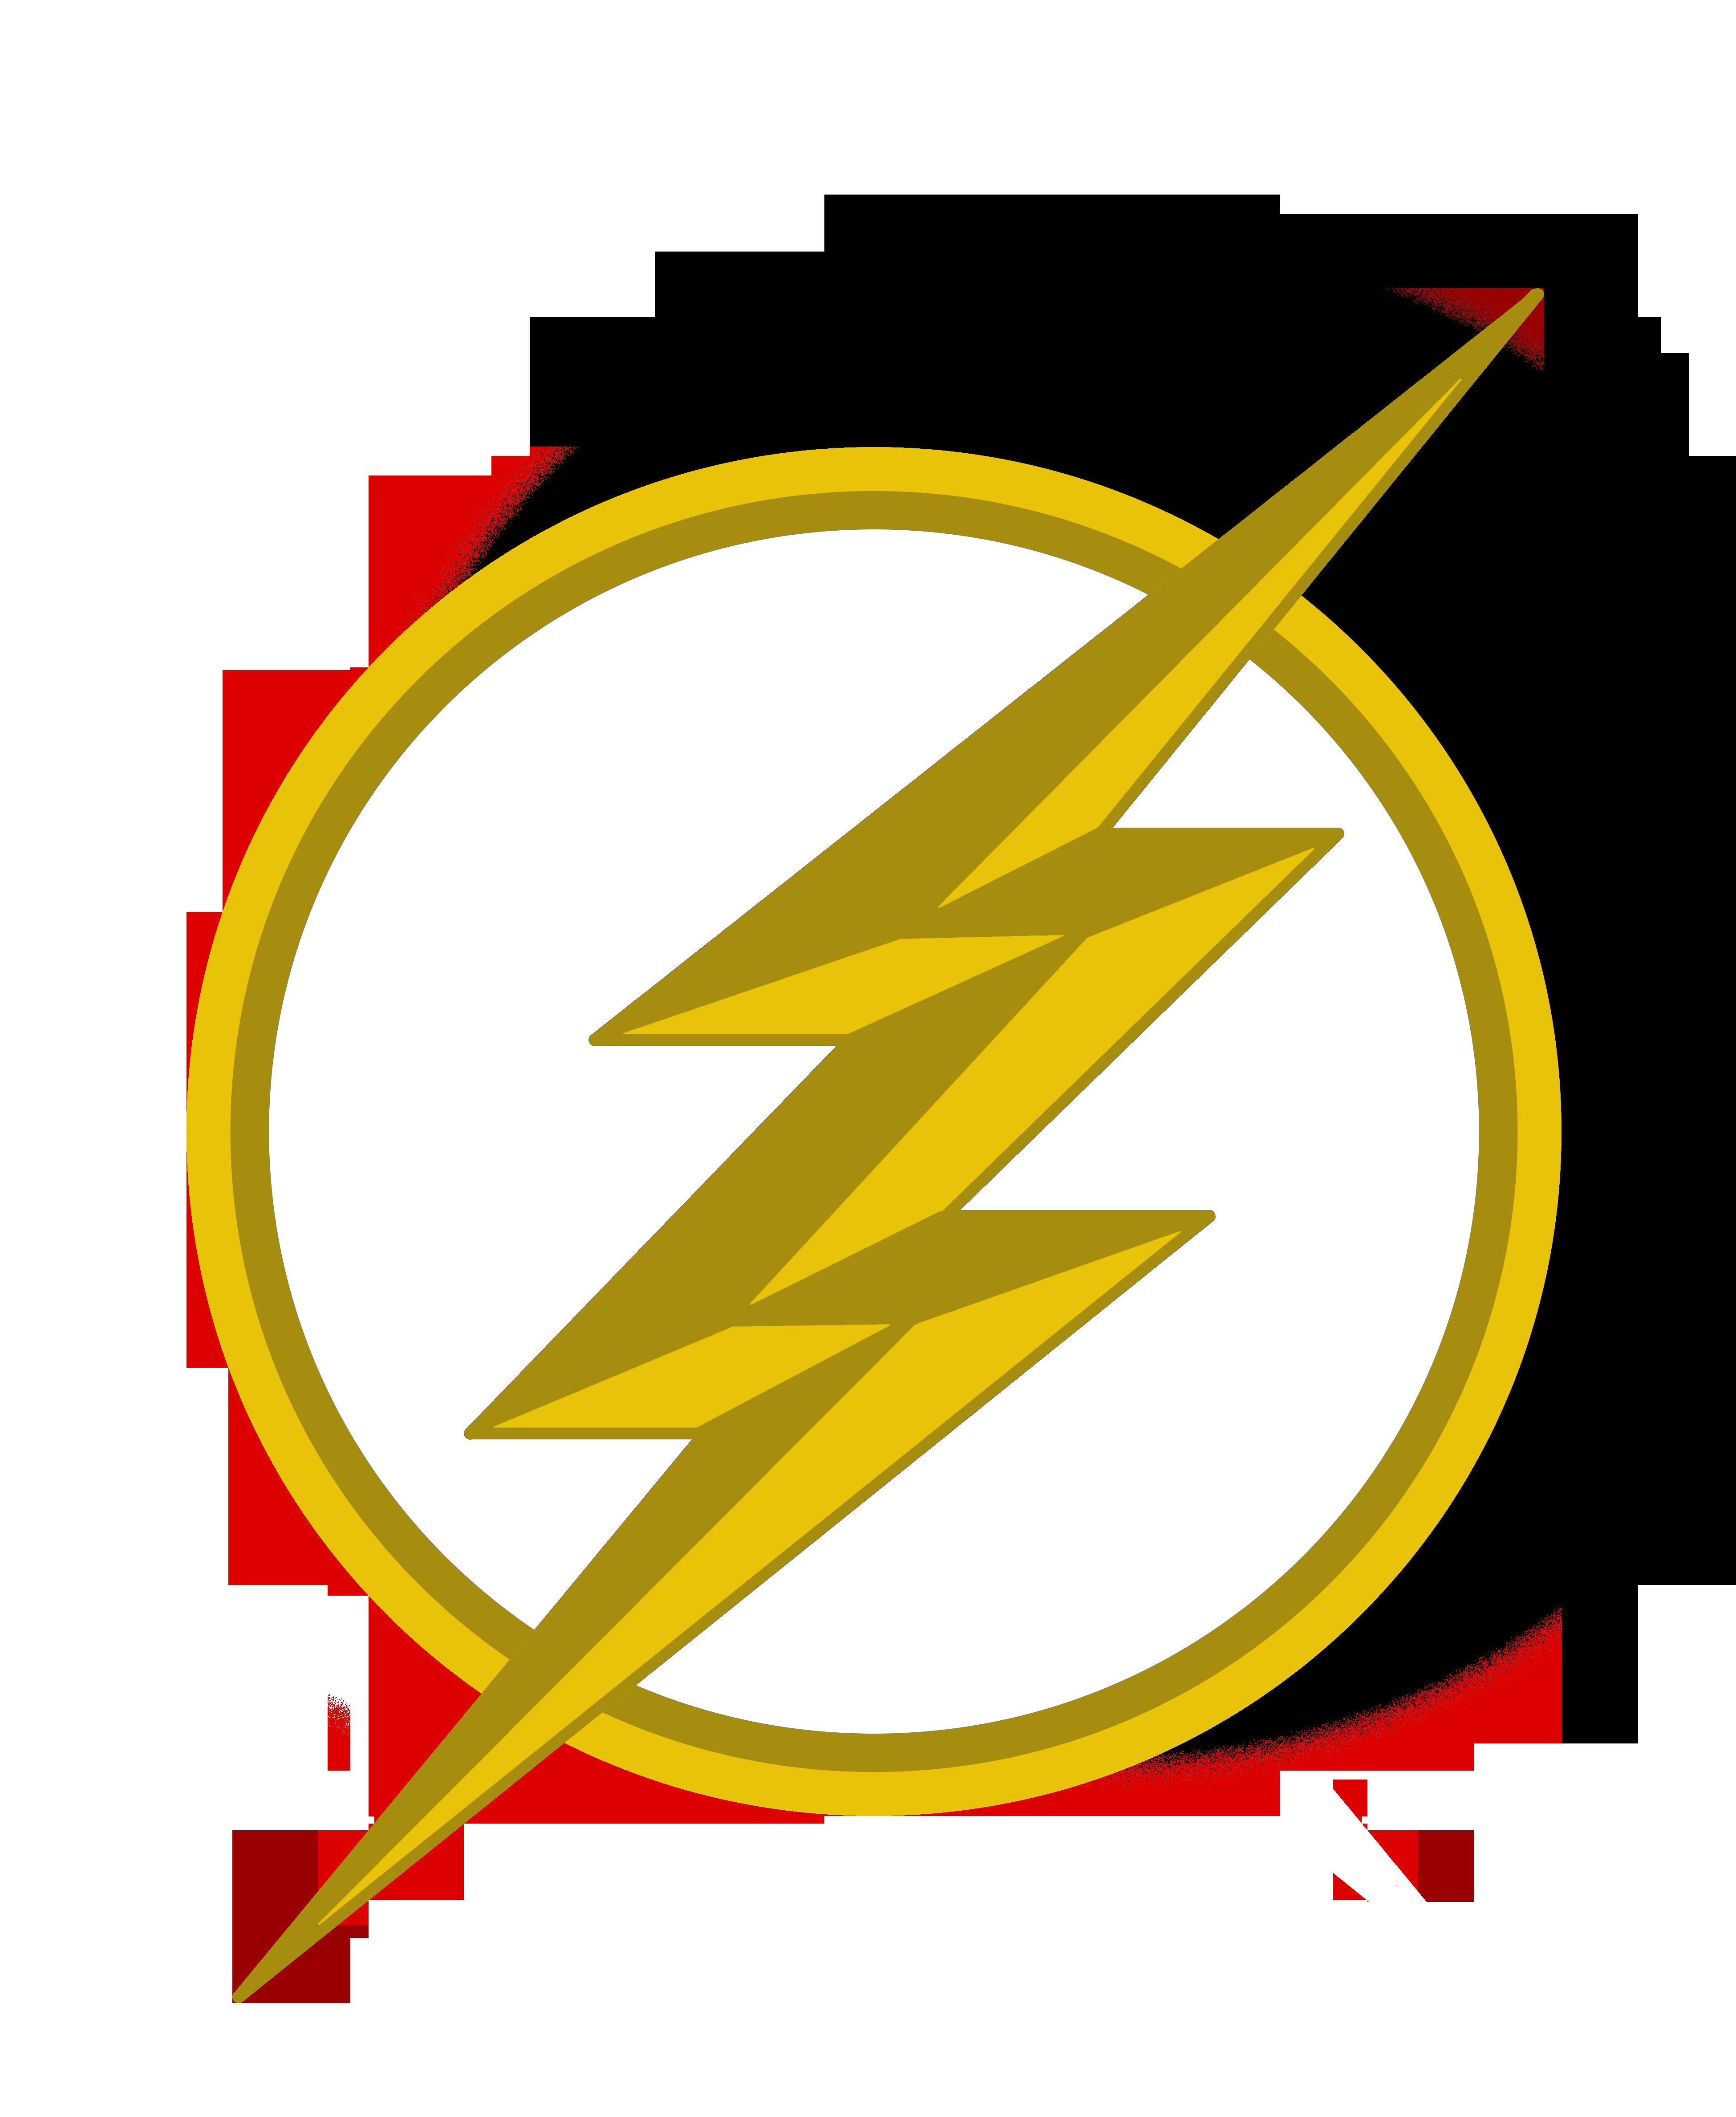 Flash clipart symbol. Logo original by u